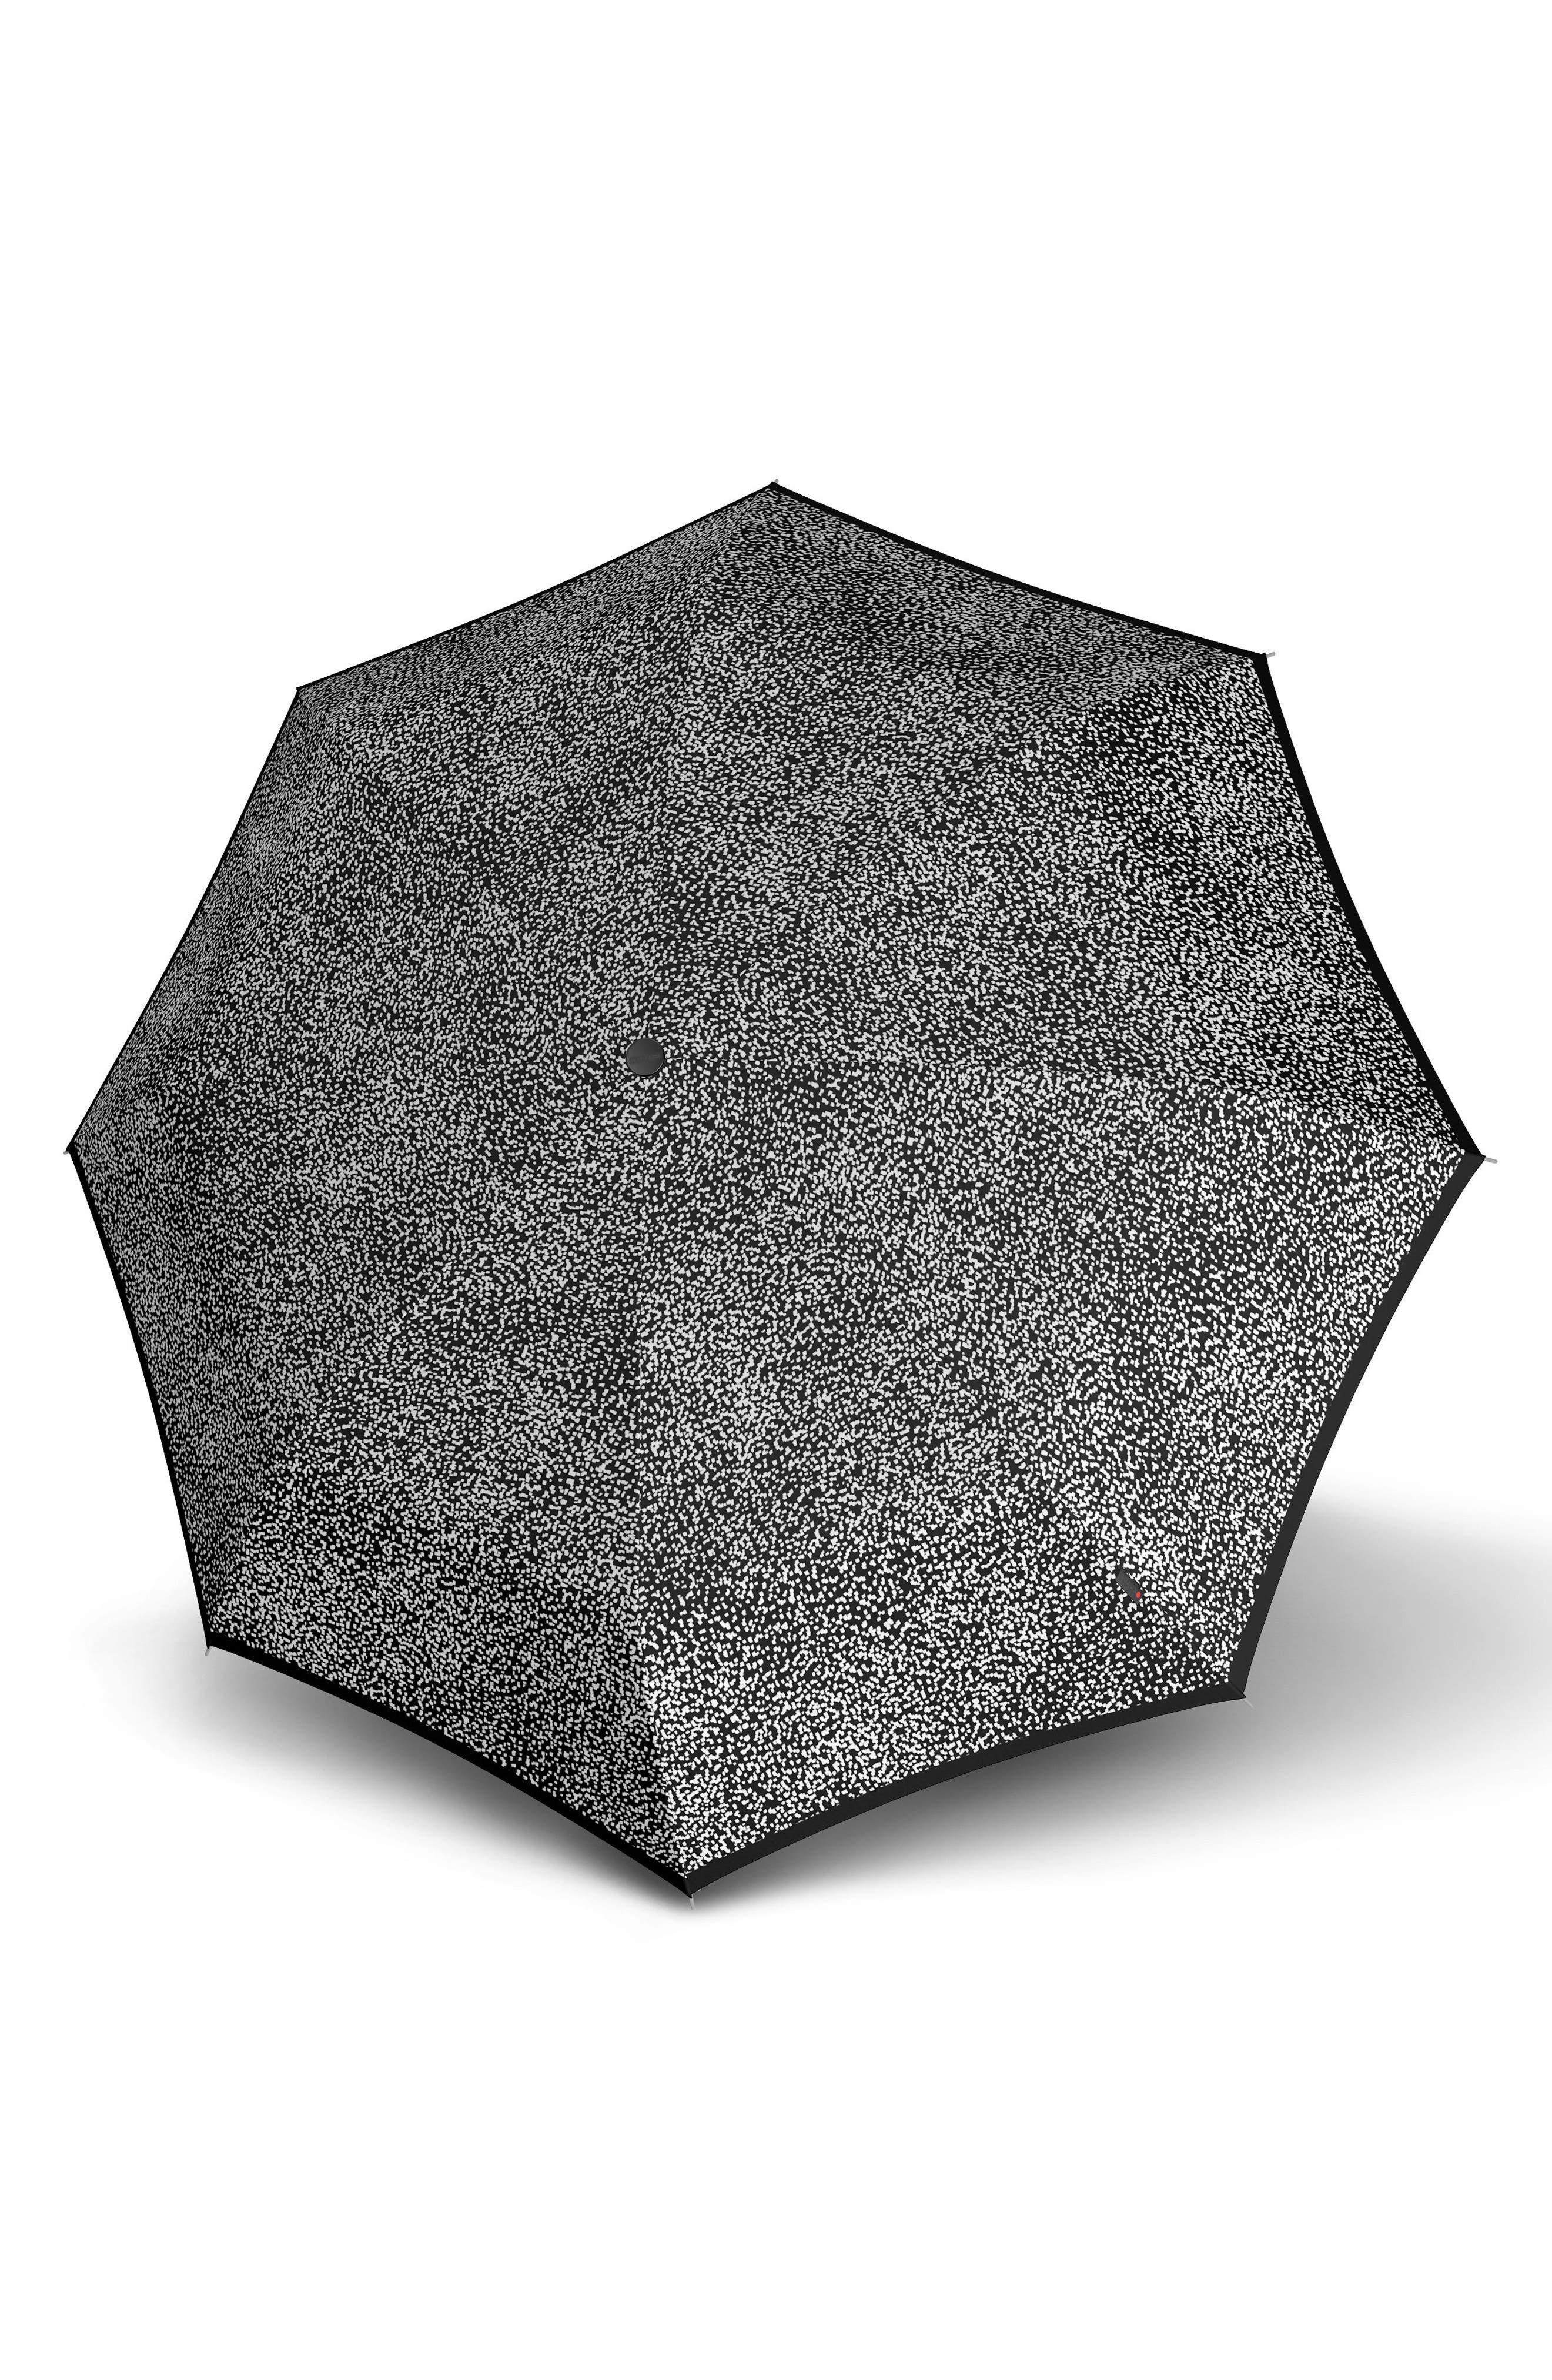 X1 Pod Manual Open/Close Umbrella,                             Alternate thumbnail 2, color,                             Nuno Black/White Snow